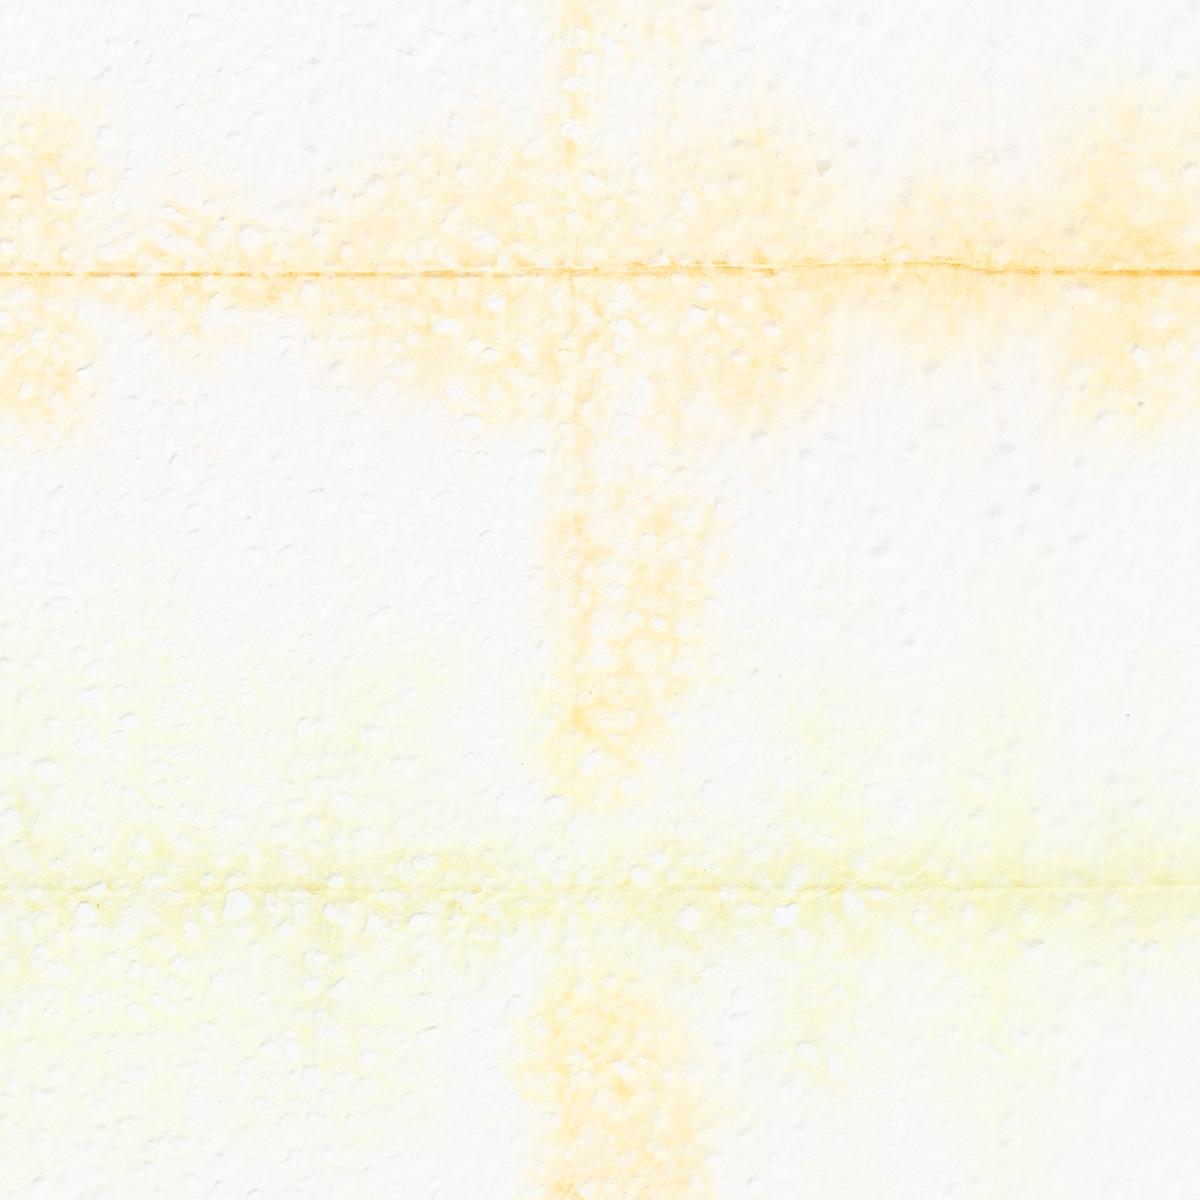 落水紙(春雨)板締め No.6